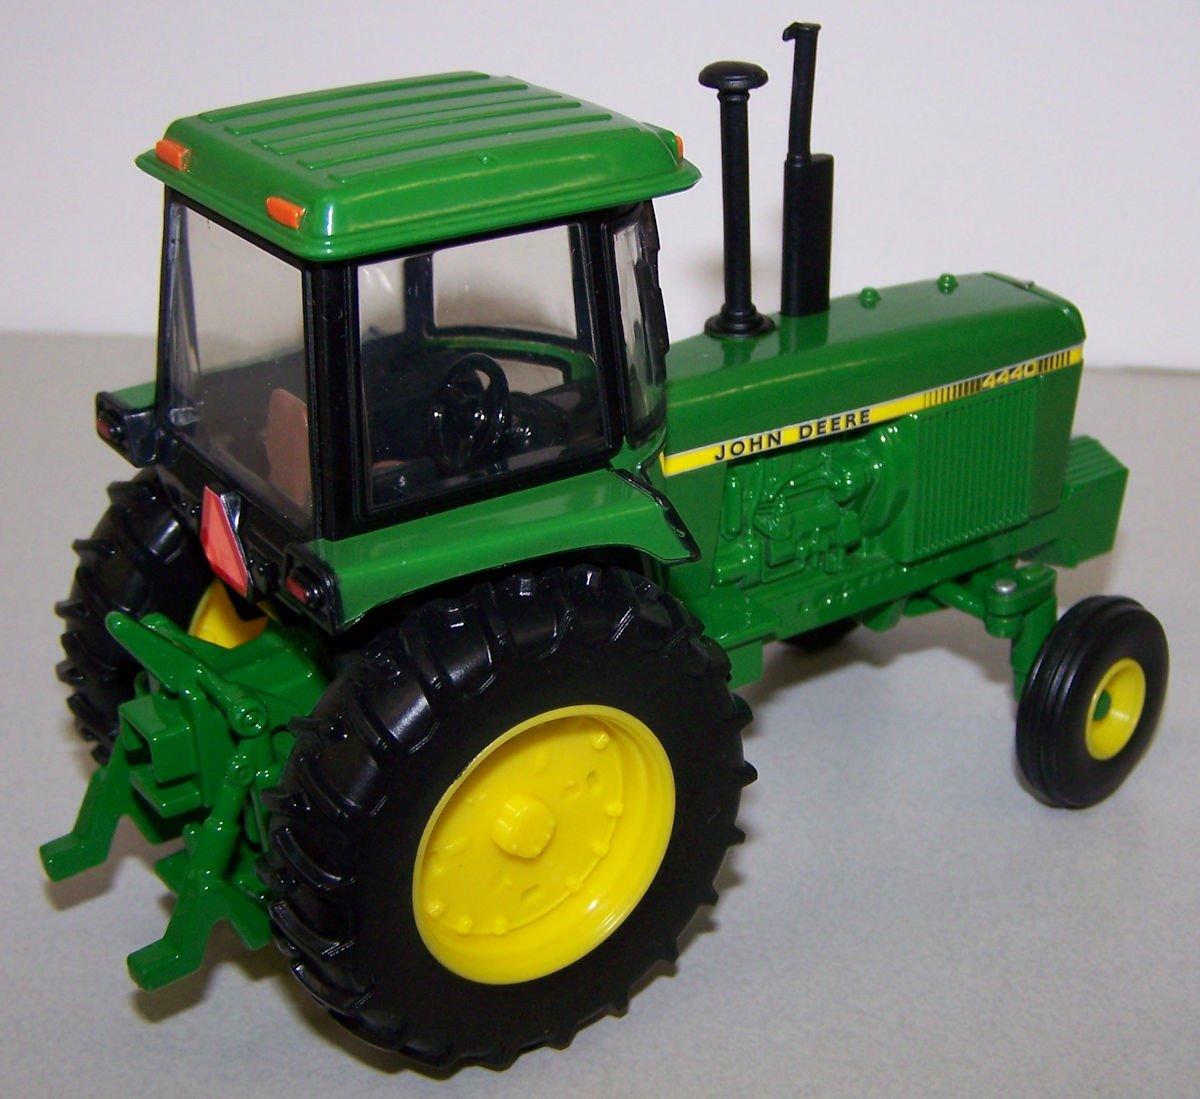 45548 1/32 John Deere 4440 Tractor   Action Toys